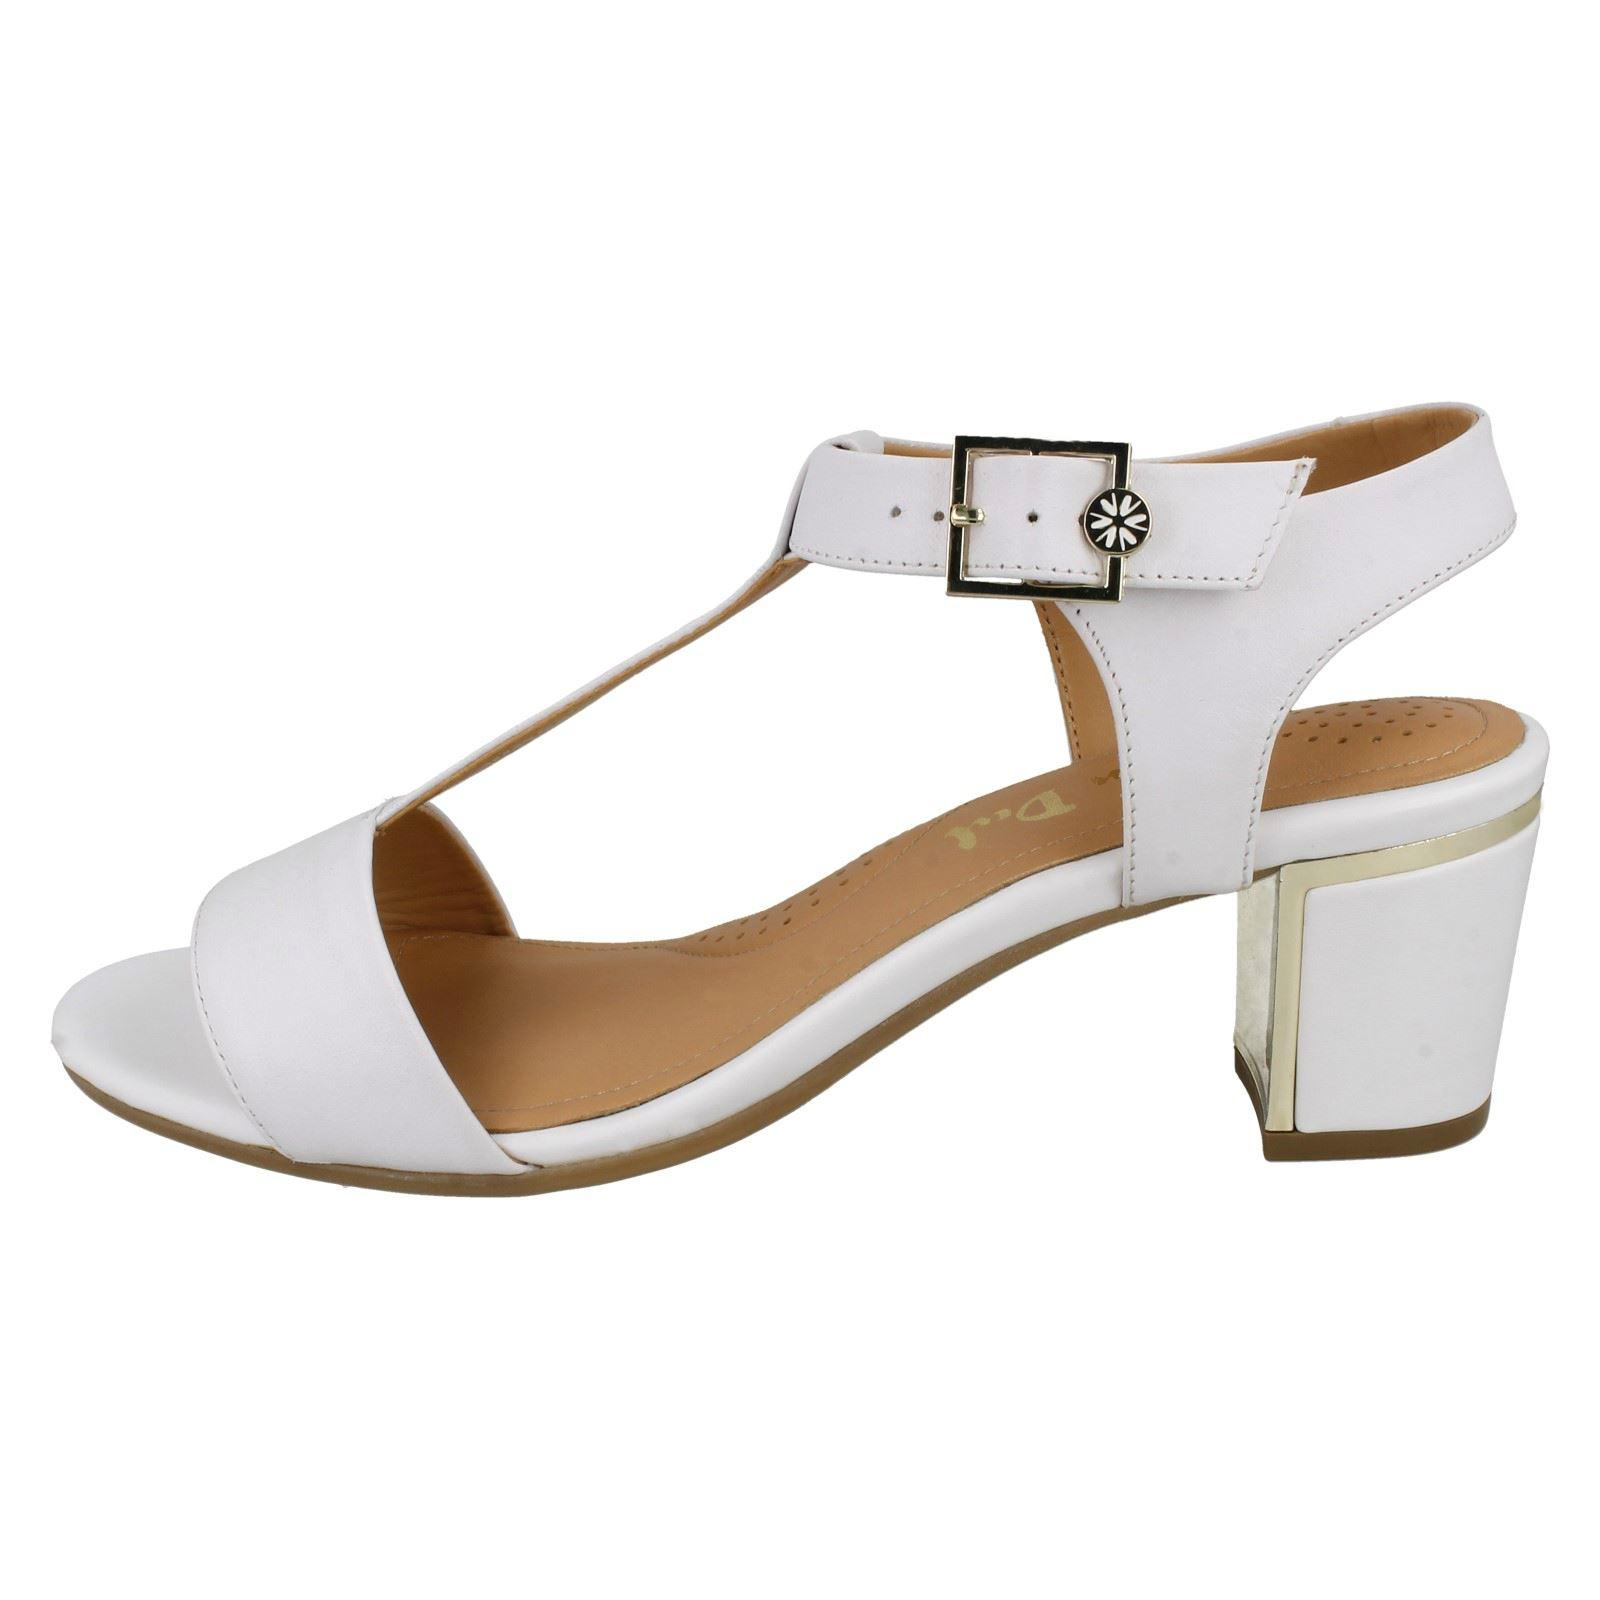 Malone Van Heeled Sandals Ladies Dal white Bright White 1qSI47